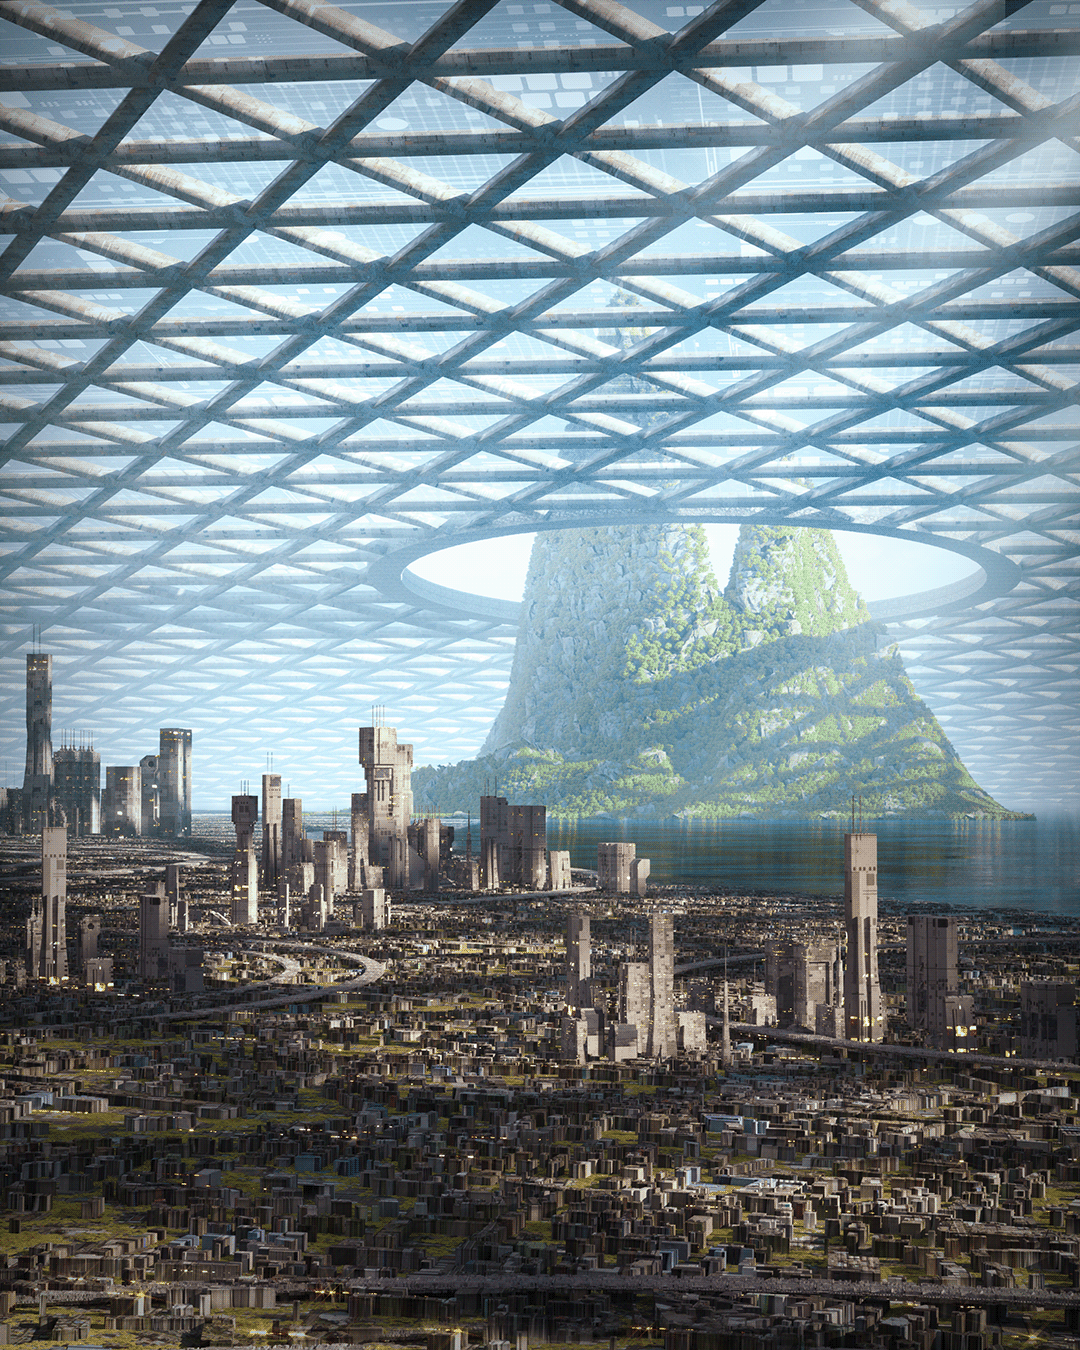 3D 3dart architecture artwork Cyberpunk design digital Render Scifi solarpunk